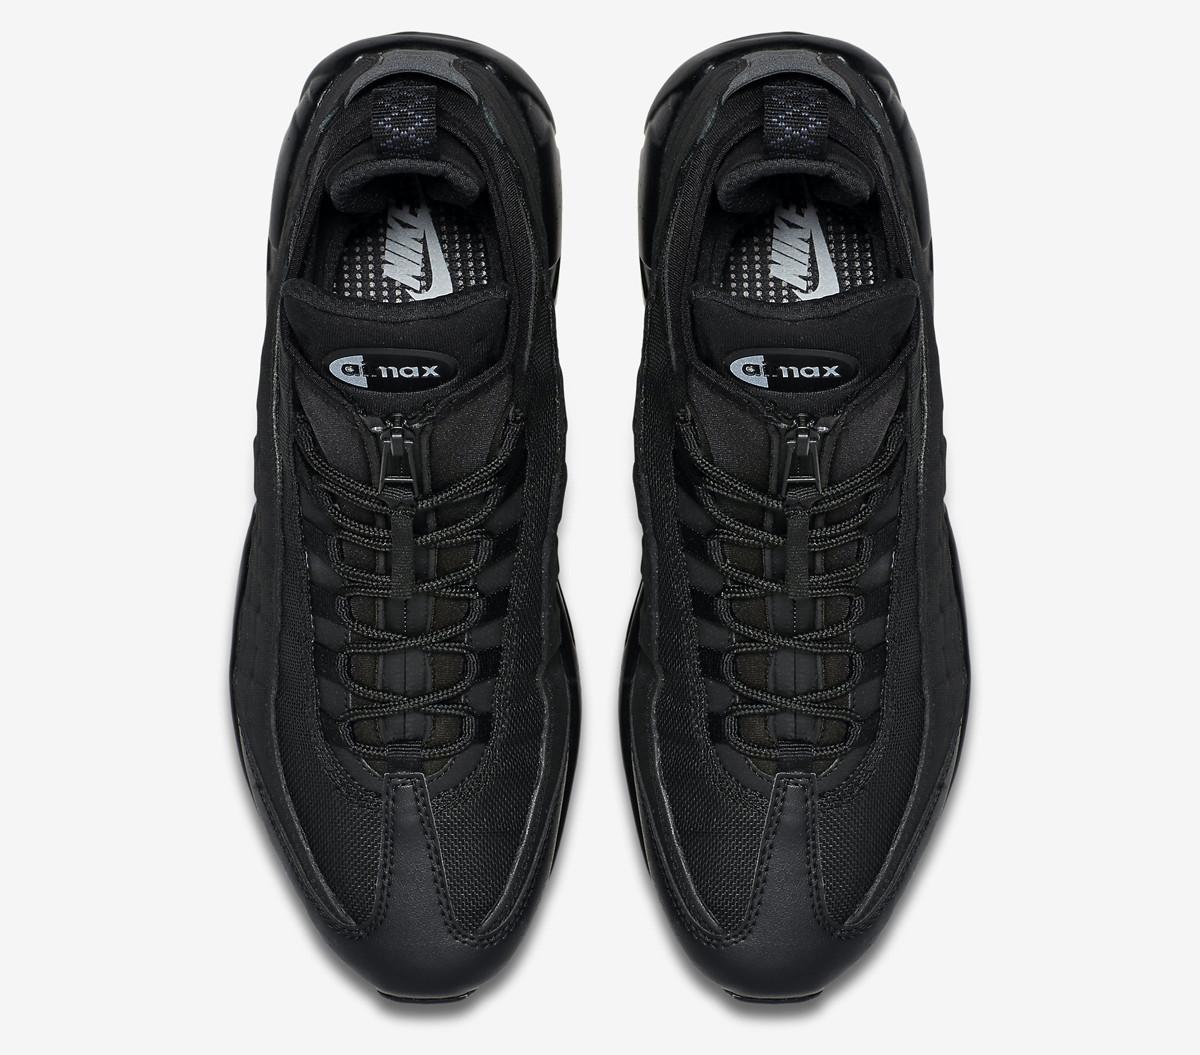 b196cb30055d ... Кроссовки Nike Air Max 95 Triple Black (Найк Аир Макс 95, реплика), ...